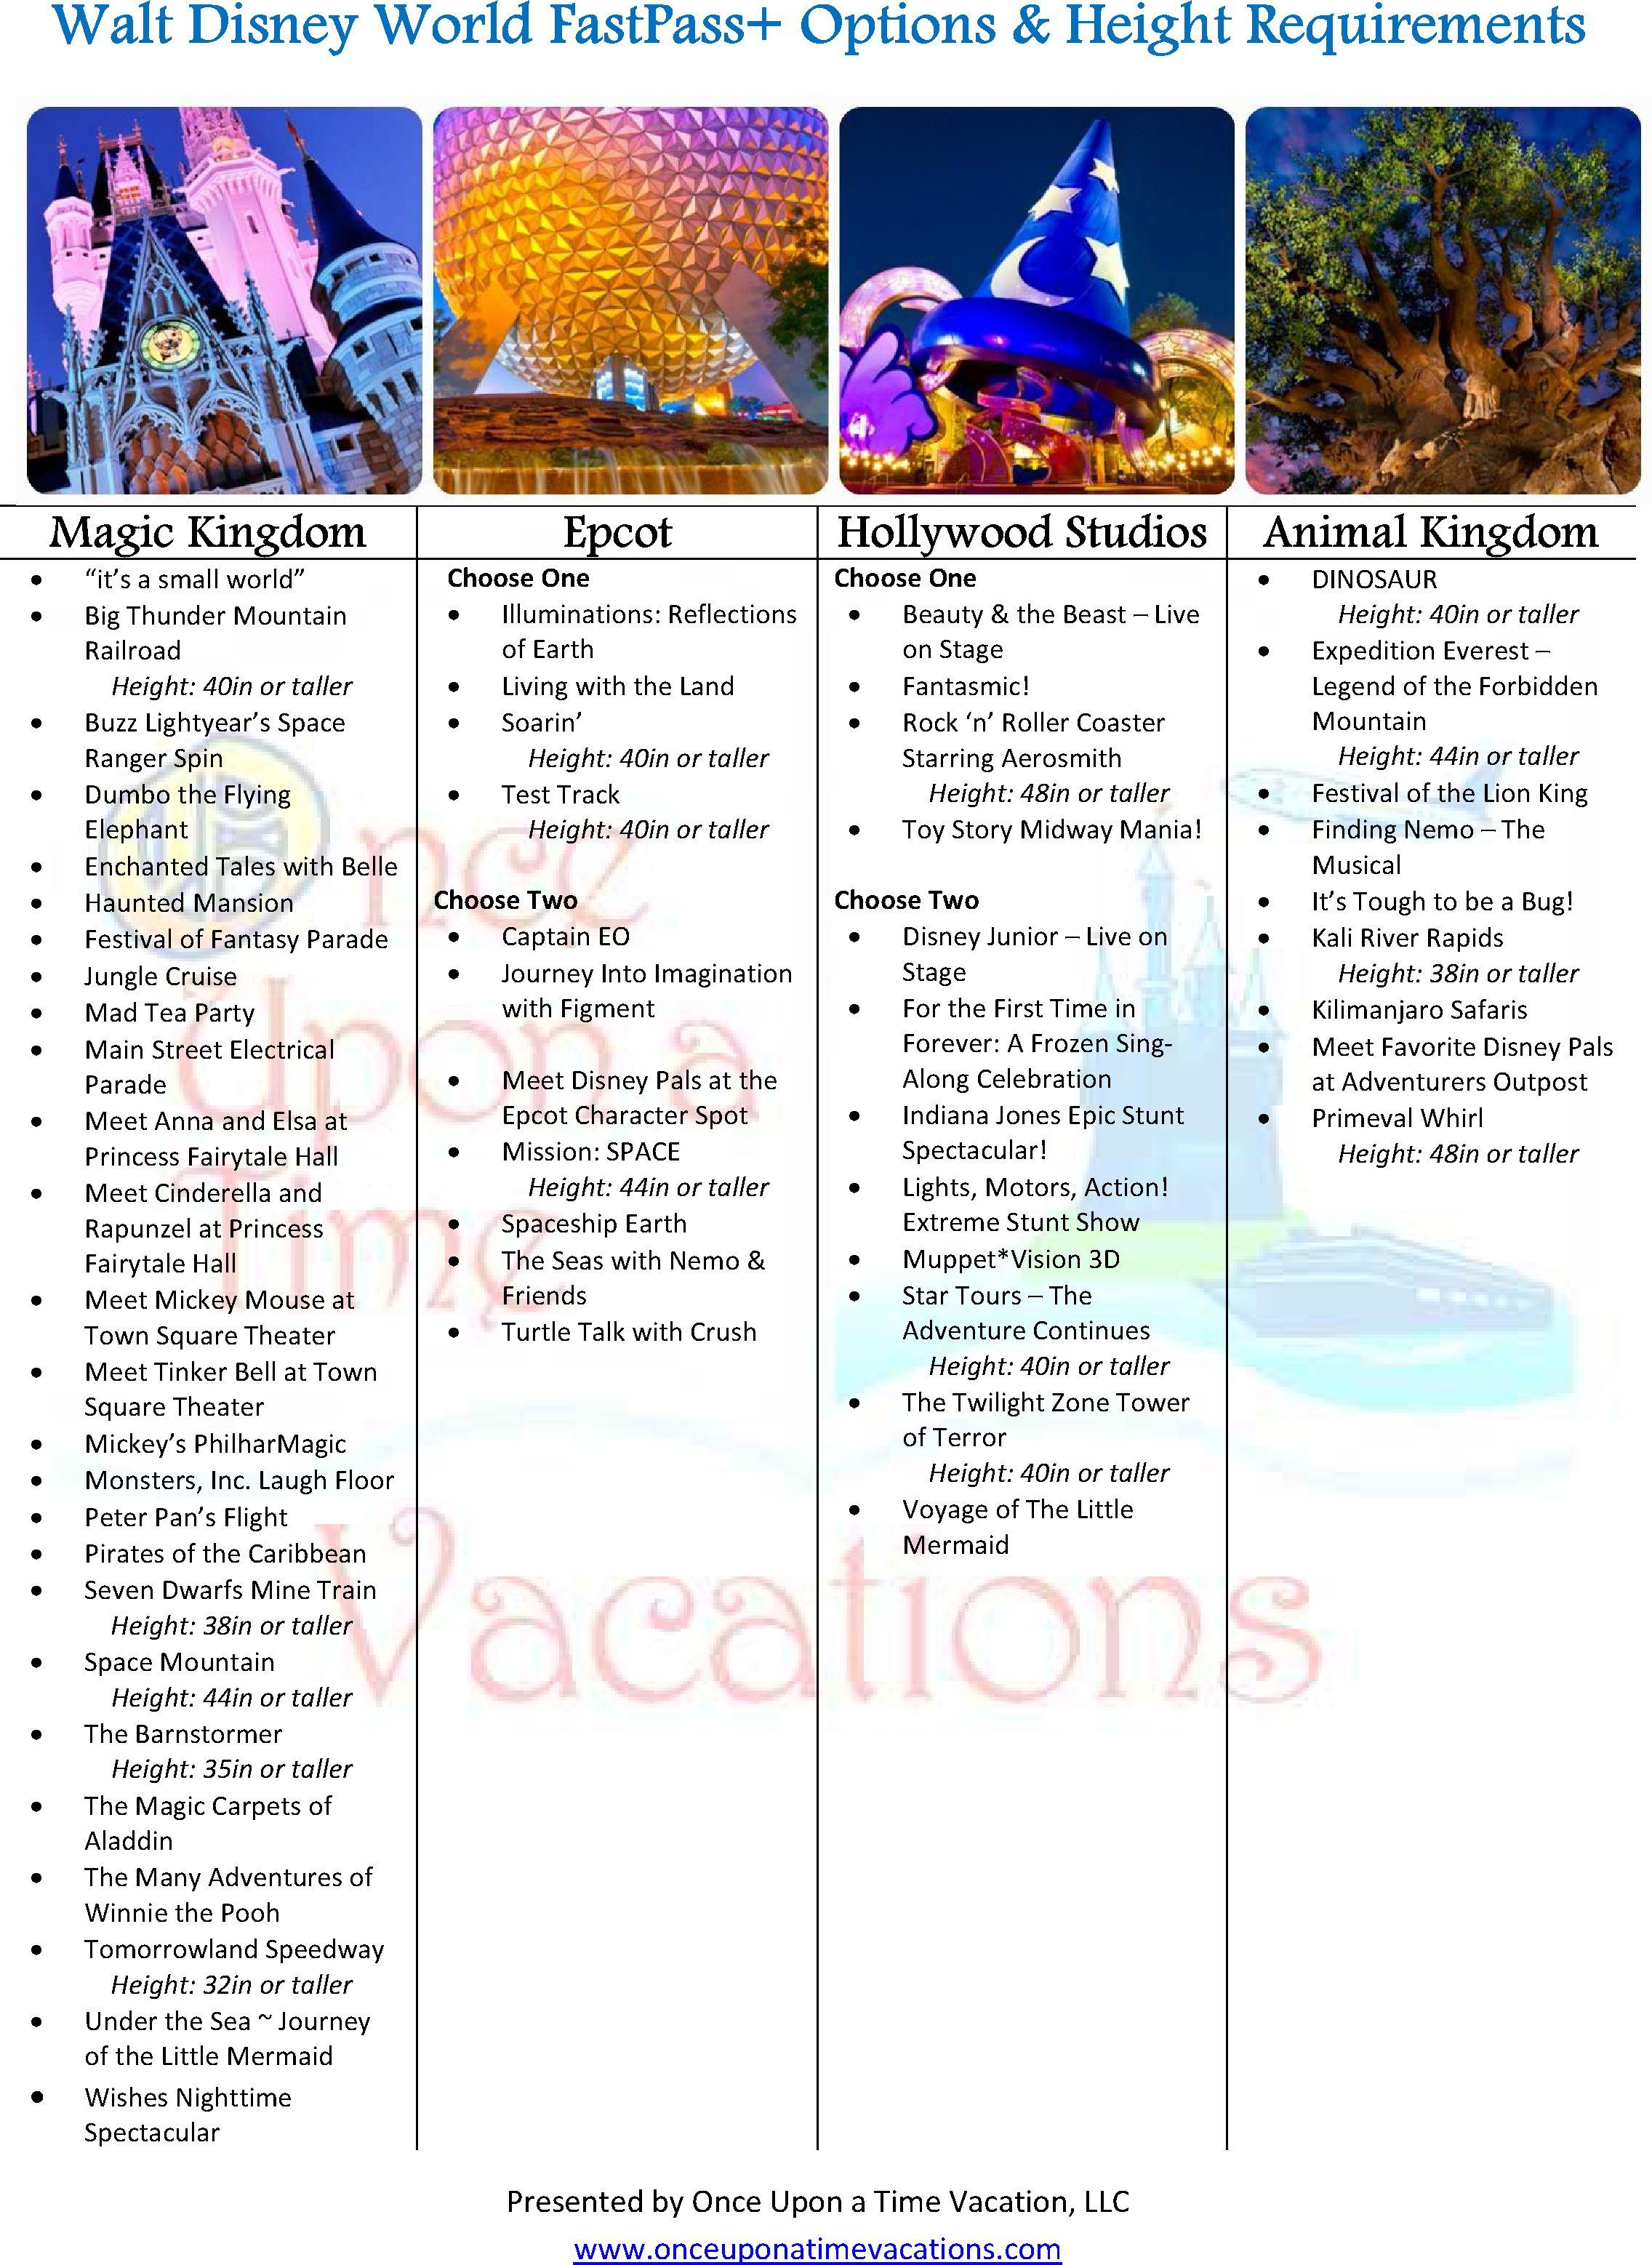 Walt Disney World 101 Fastpass Tiers And Recommendations Disney Disney Disney